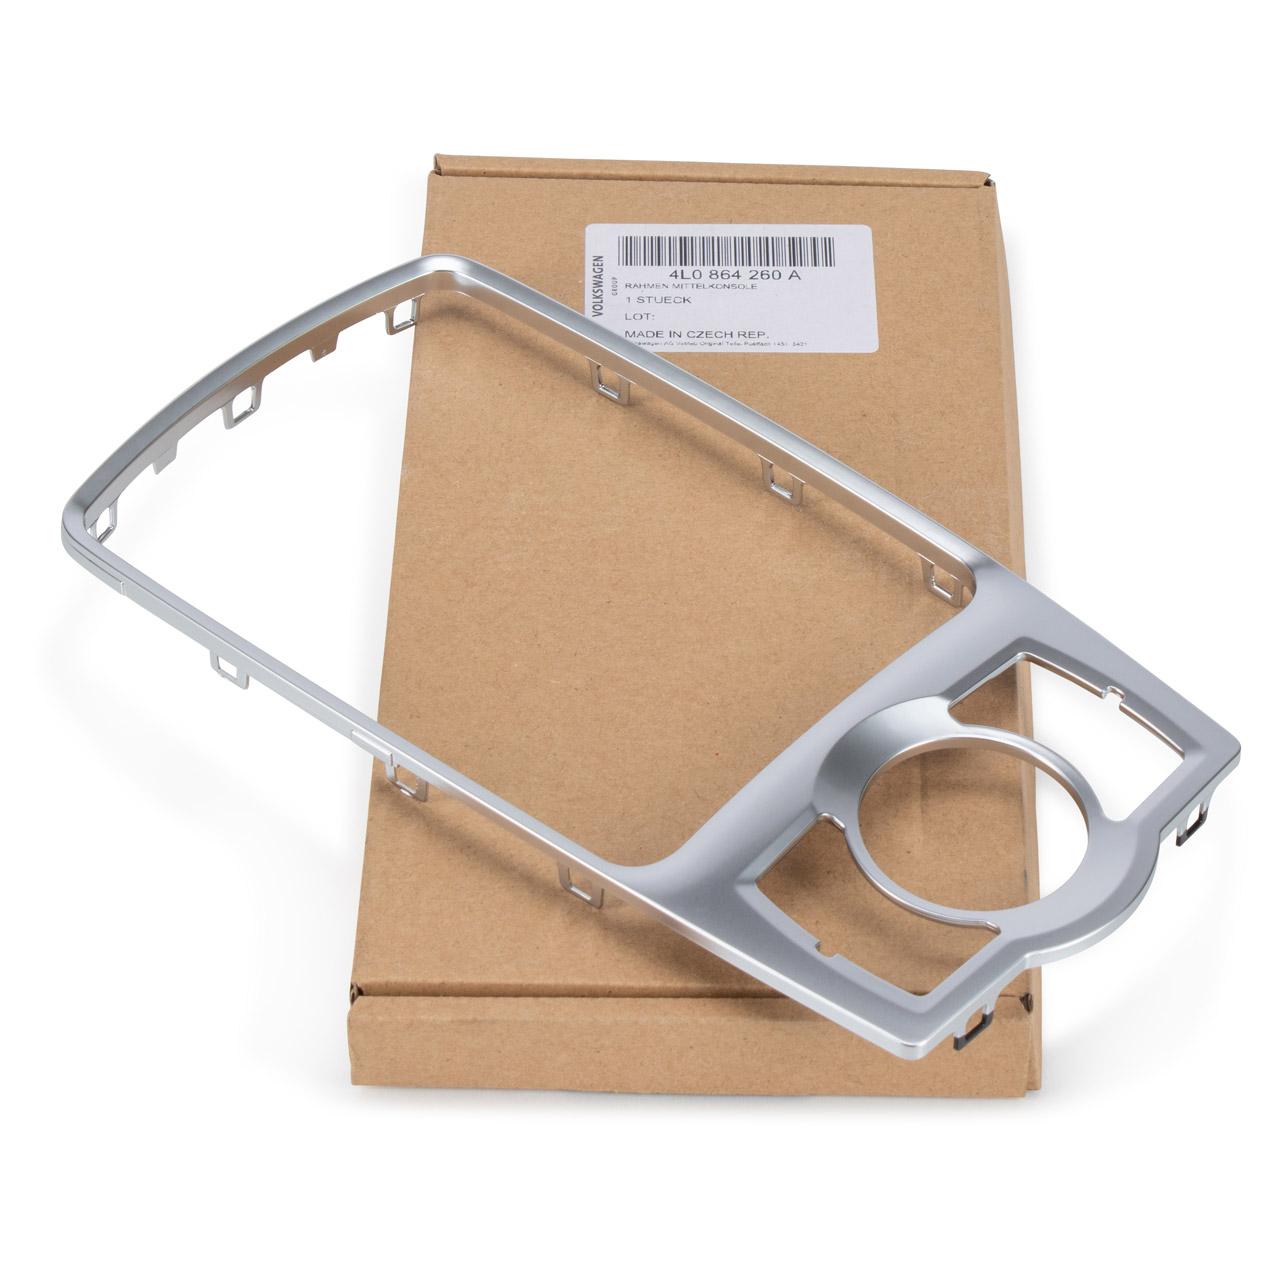 ORIGINAL Audi Rahmen Halterahmen Mittelkonsole Bedieneinheit Q7 4LB 4L0864260A